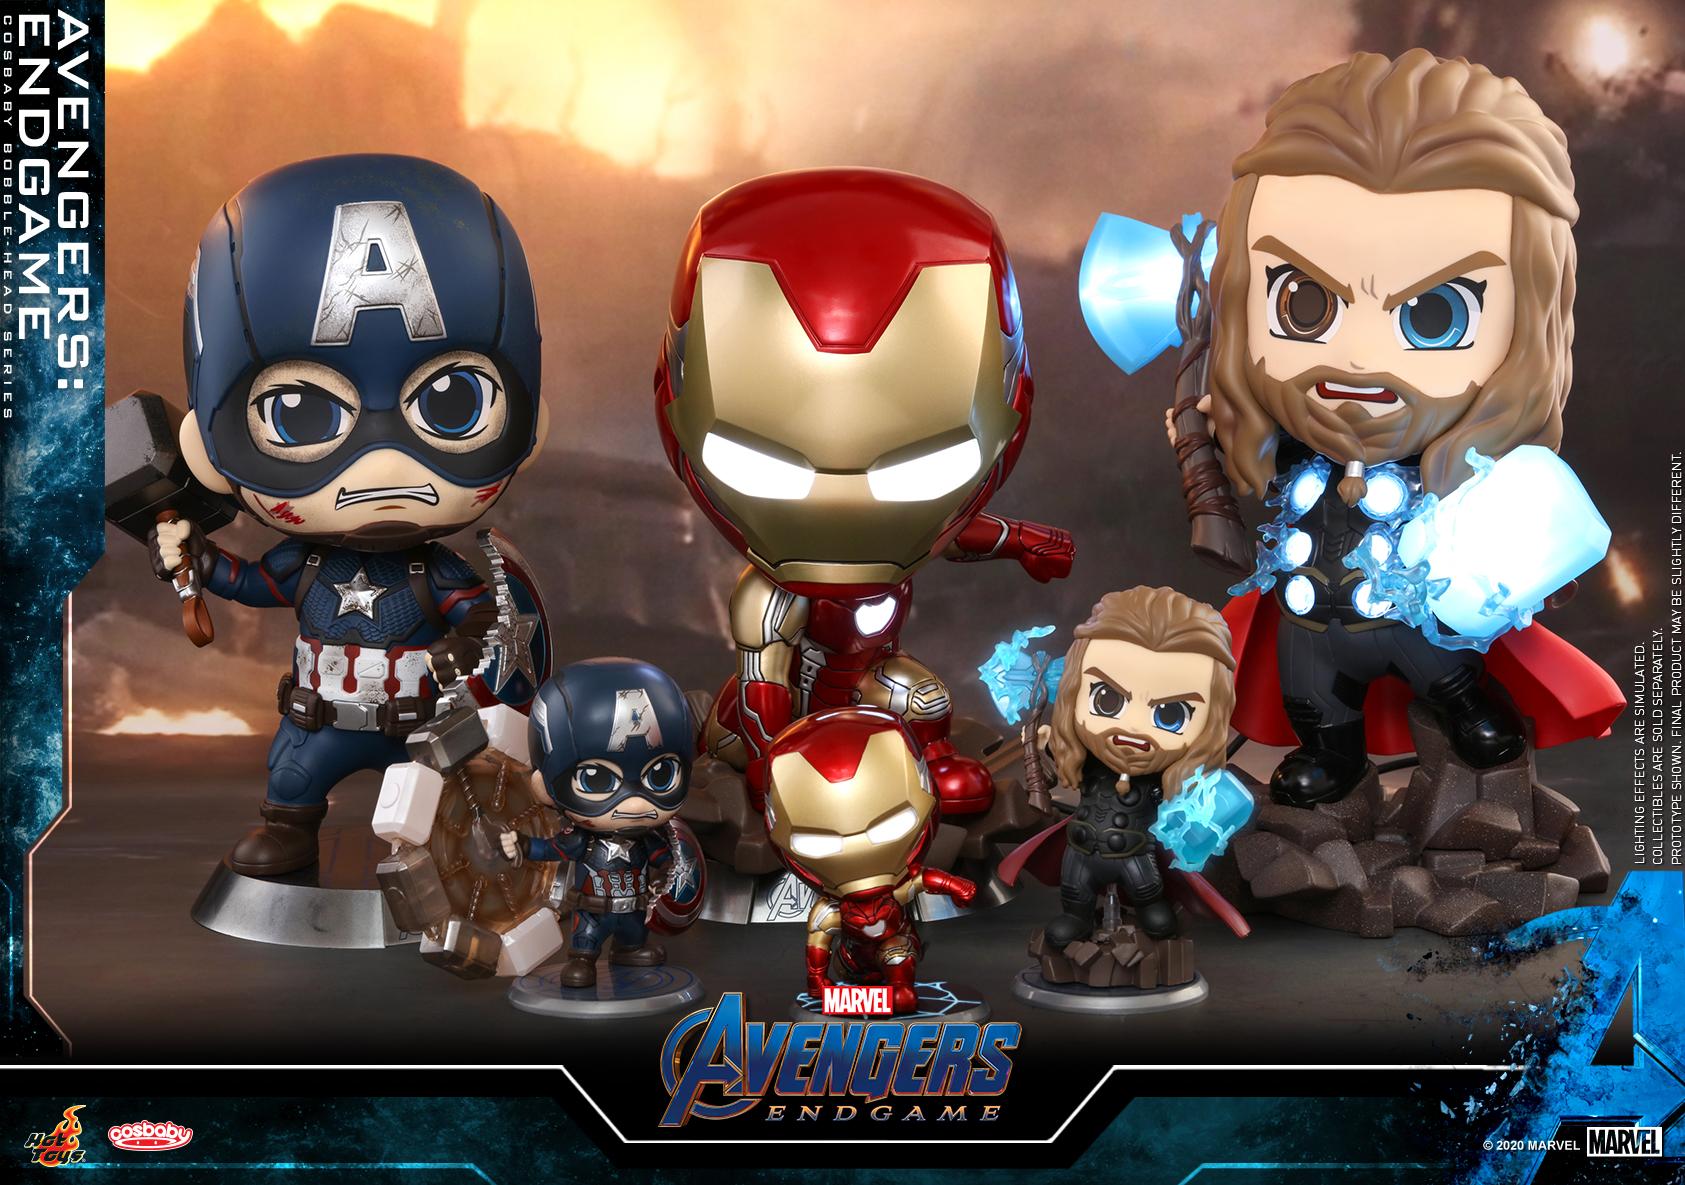 Hot Toys - Avengers - Endgame Cosbaby_PR1